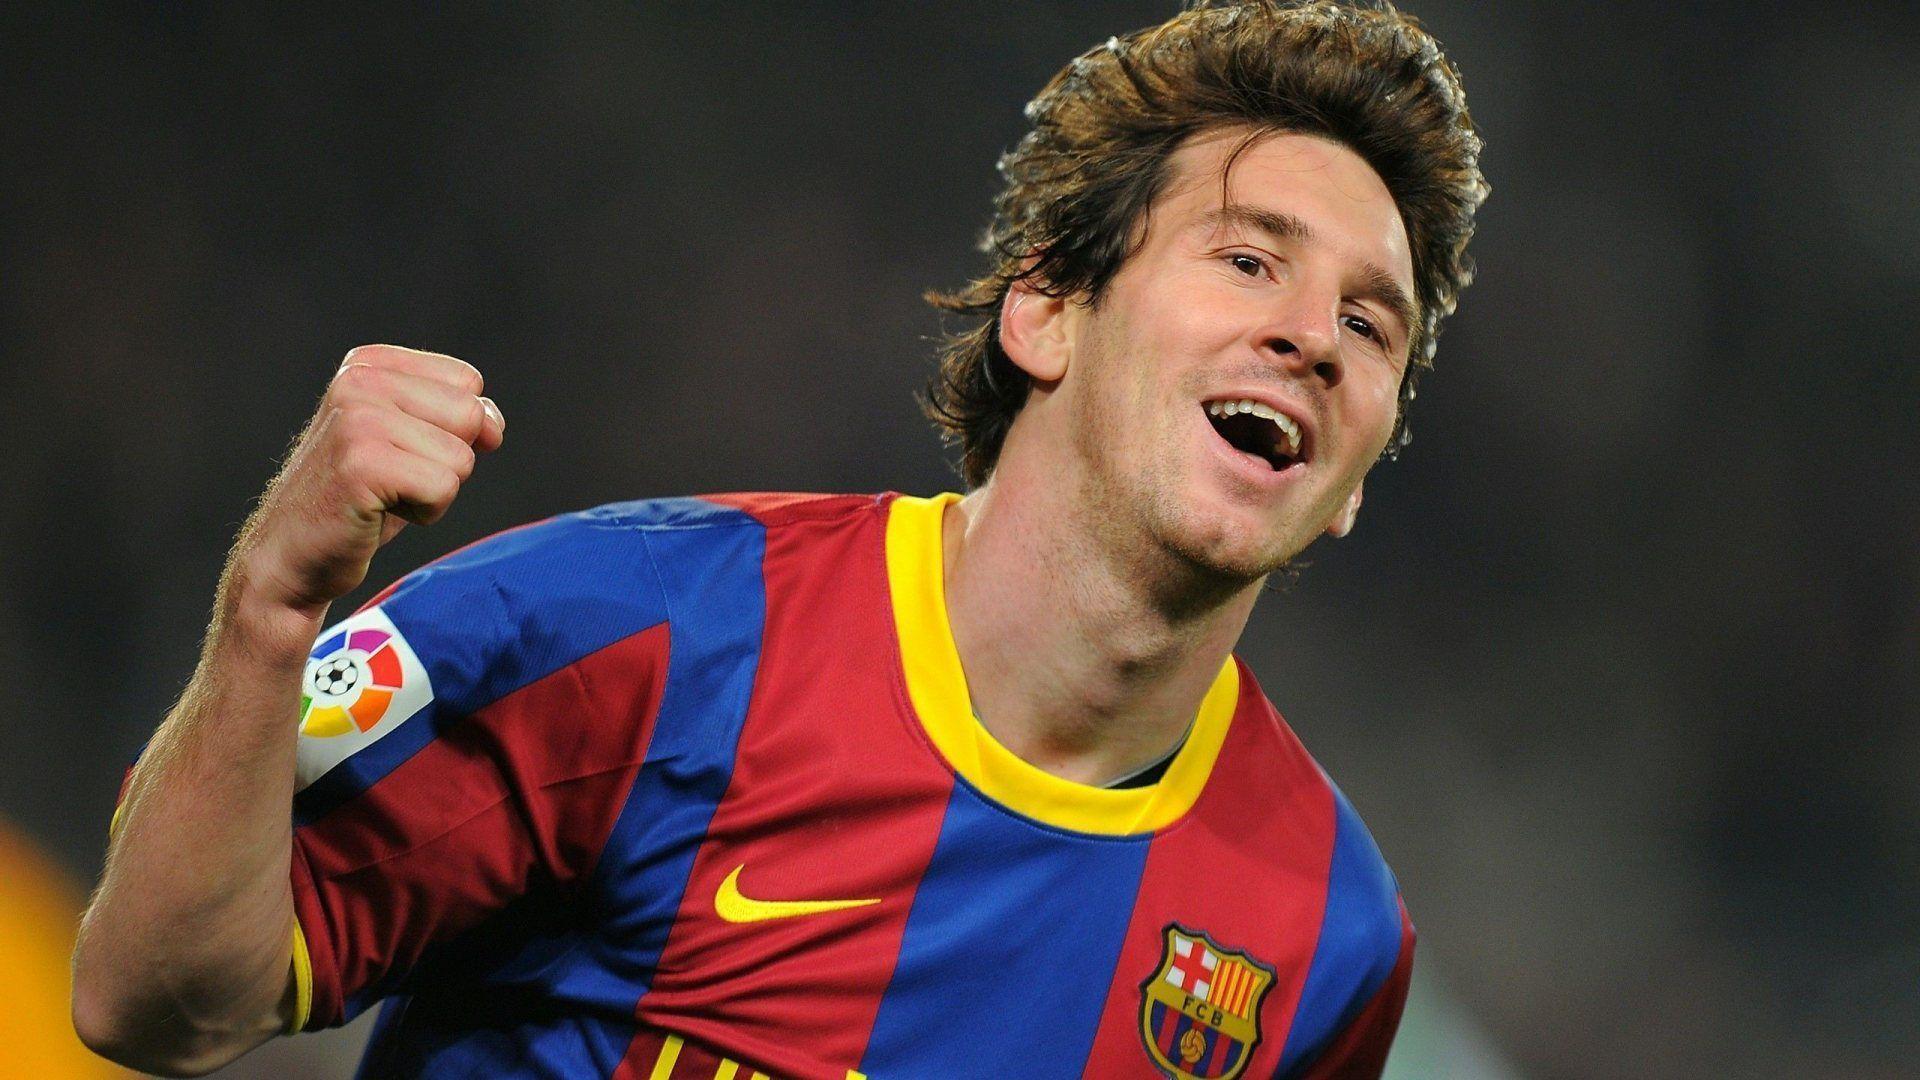 Pix for Gt Messi Hd Wallpapers Desktop 1920x1080PX ~ Neymar Hd ...